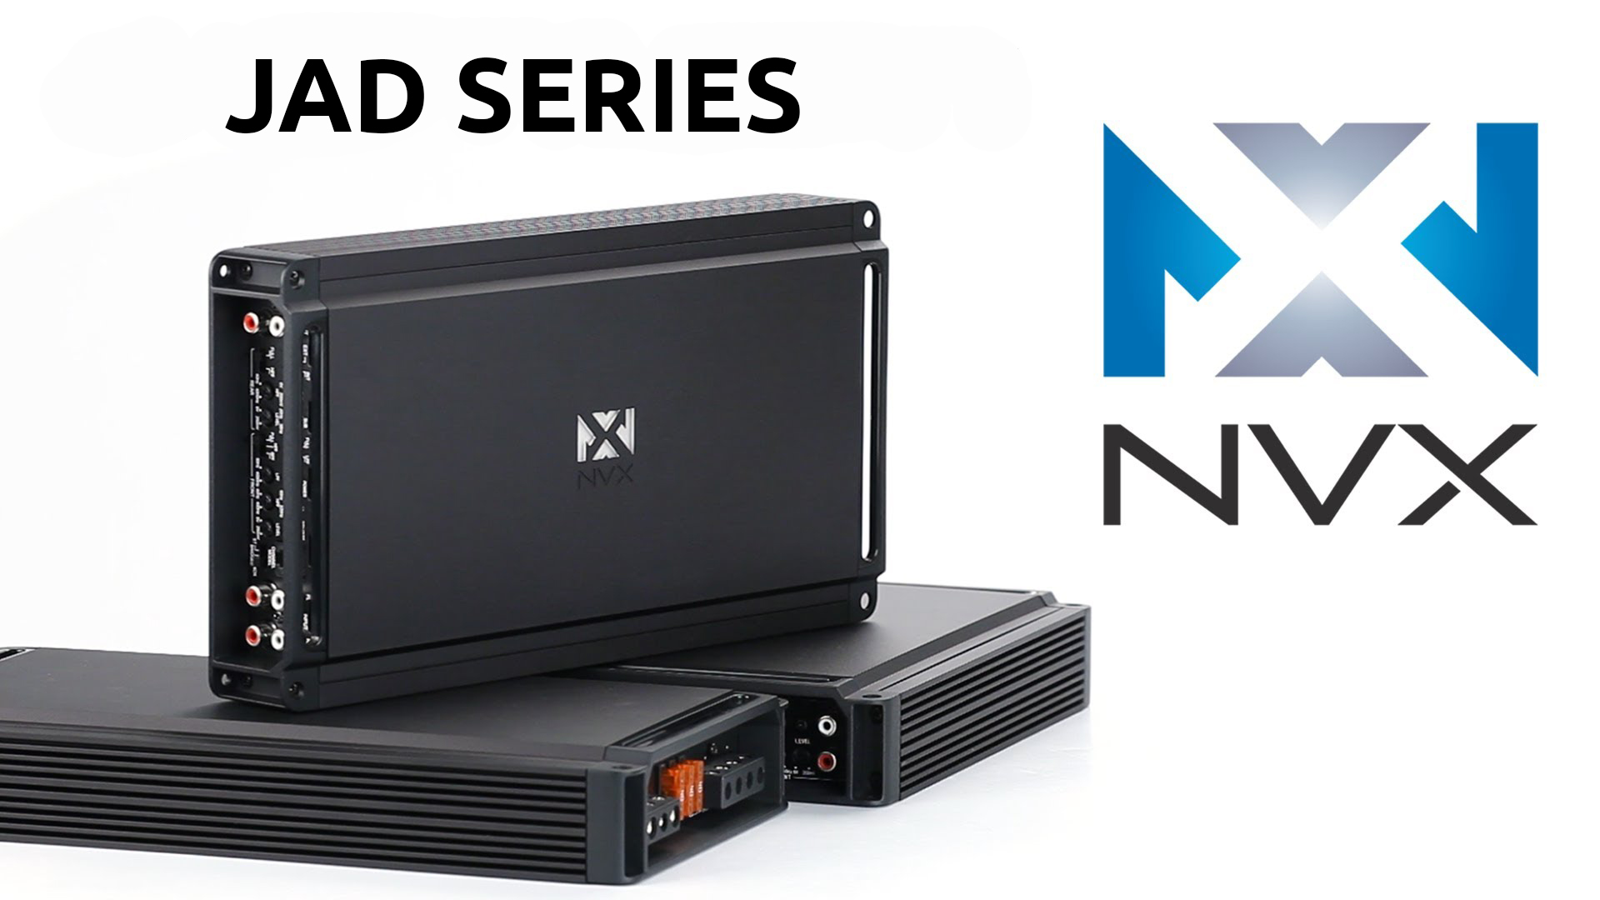 Sonic Electronix Major Price Drop On Nvx Jad Series Amps Milled Shop Nvxs Premium Amplifier Line